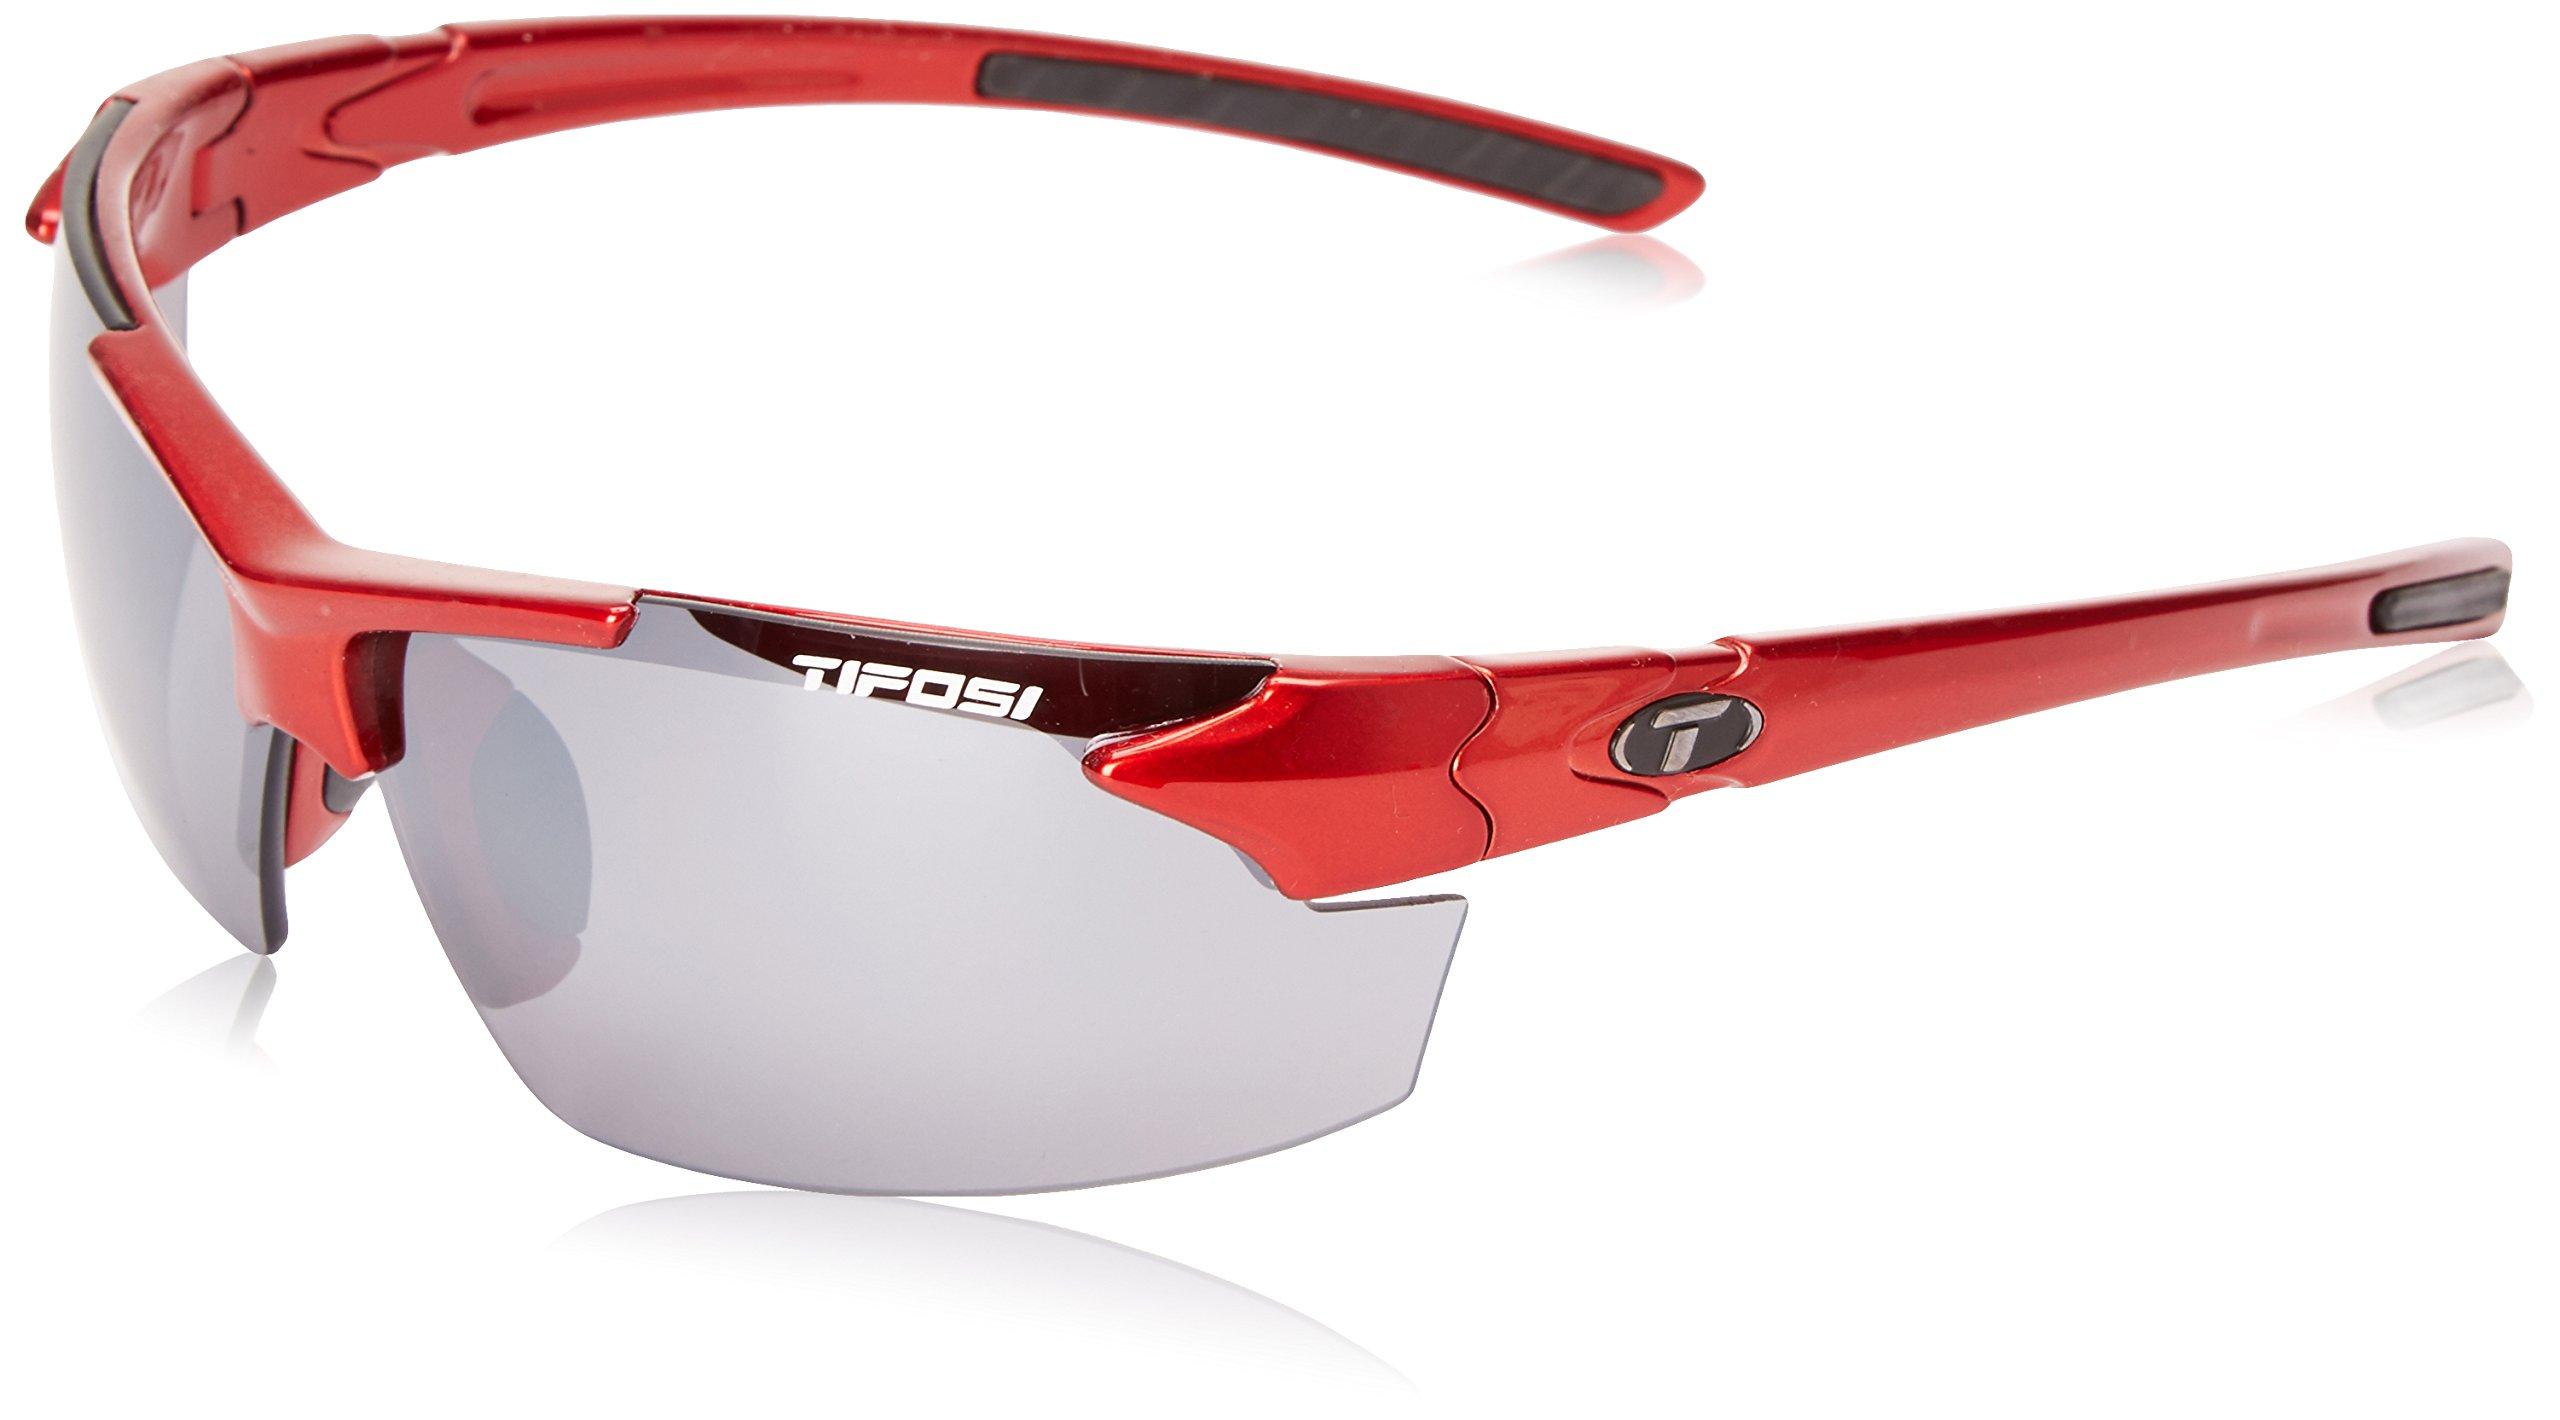 Tifosi Jet FC 1140402770 Wrap Sunglasses, Metallic Red, 70 mm